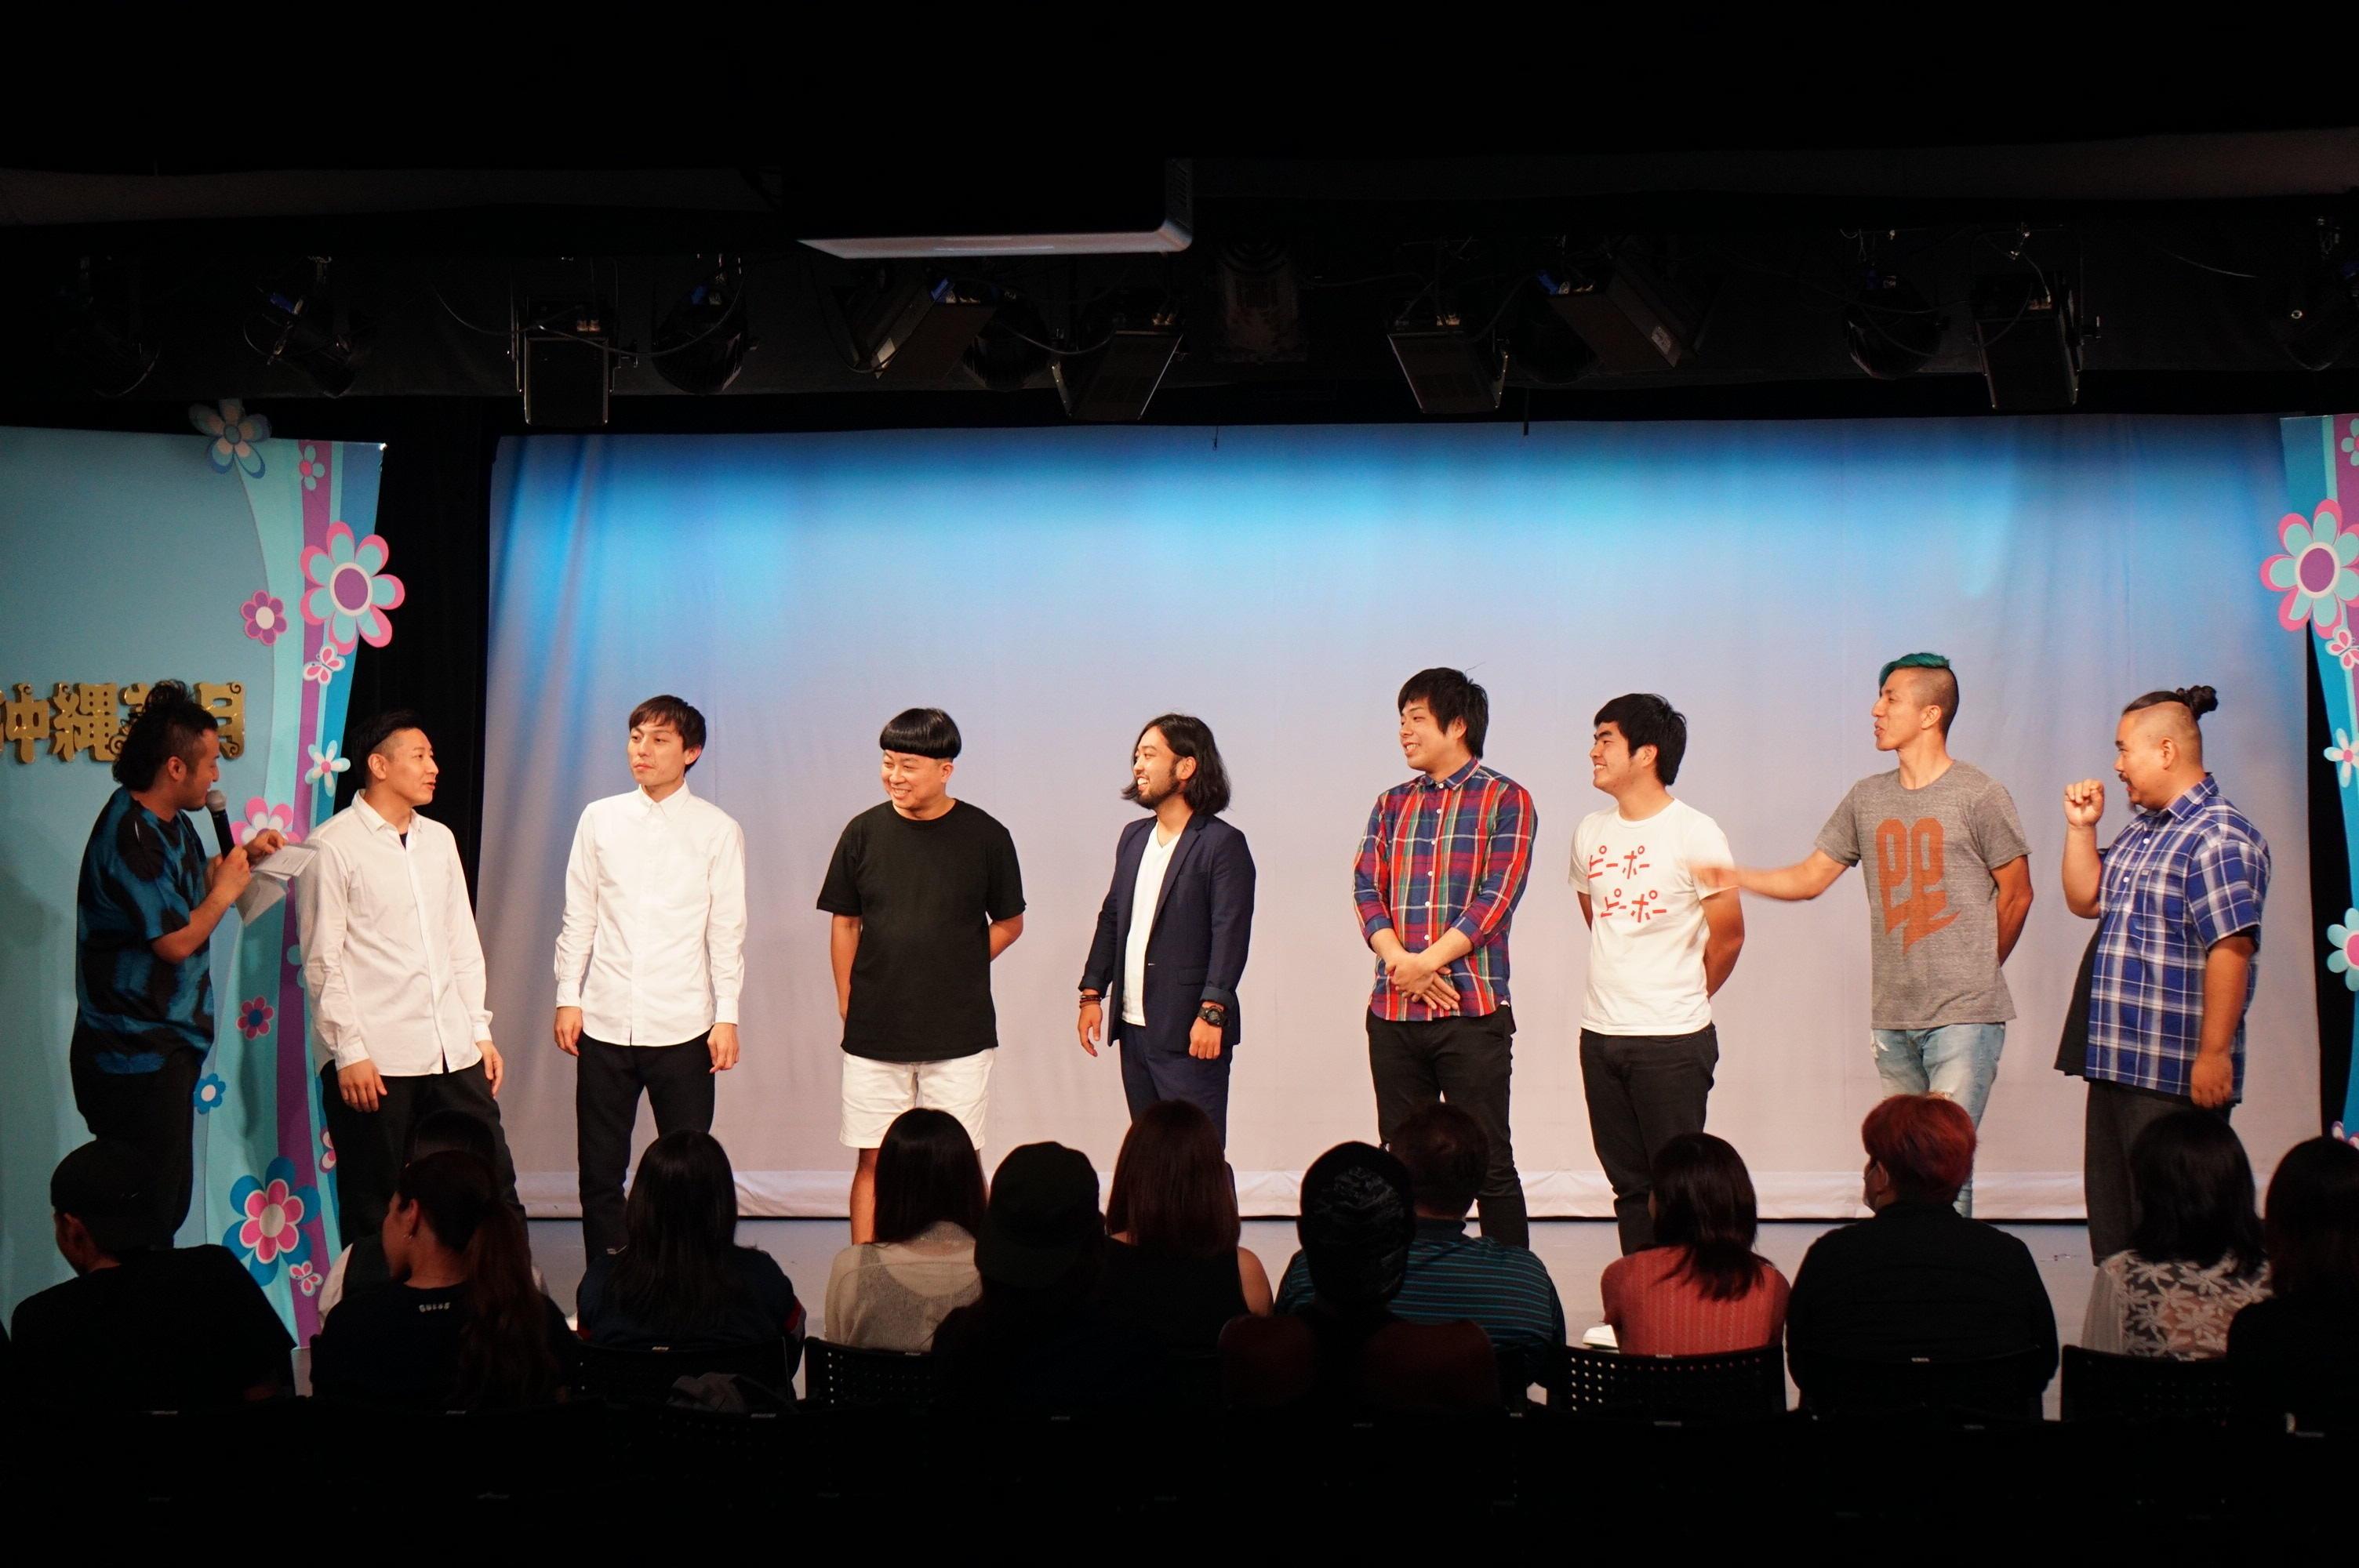 http://news.yoshimoto.co.jp/20160526174103-b83b46a85003b32c54fad90dad57f7dd9b8acd31.jpg